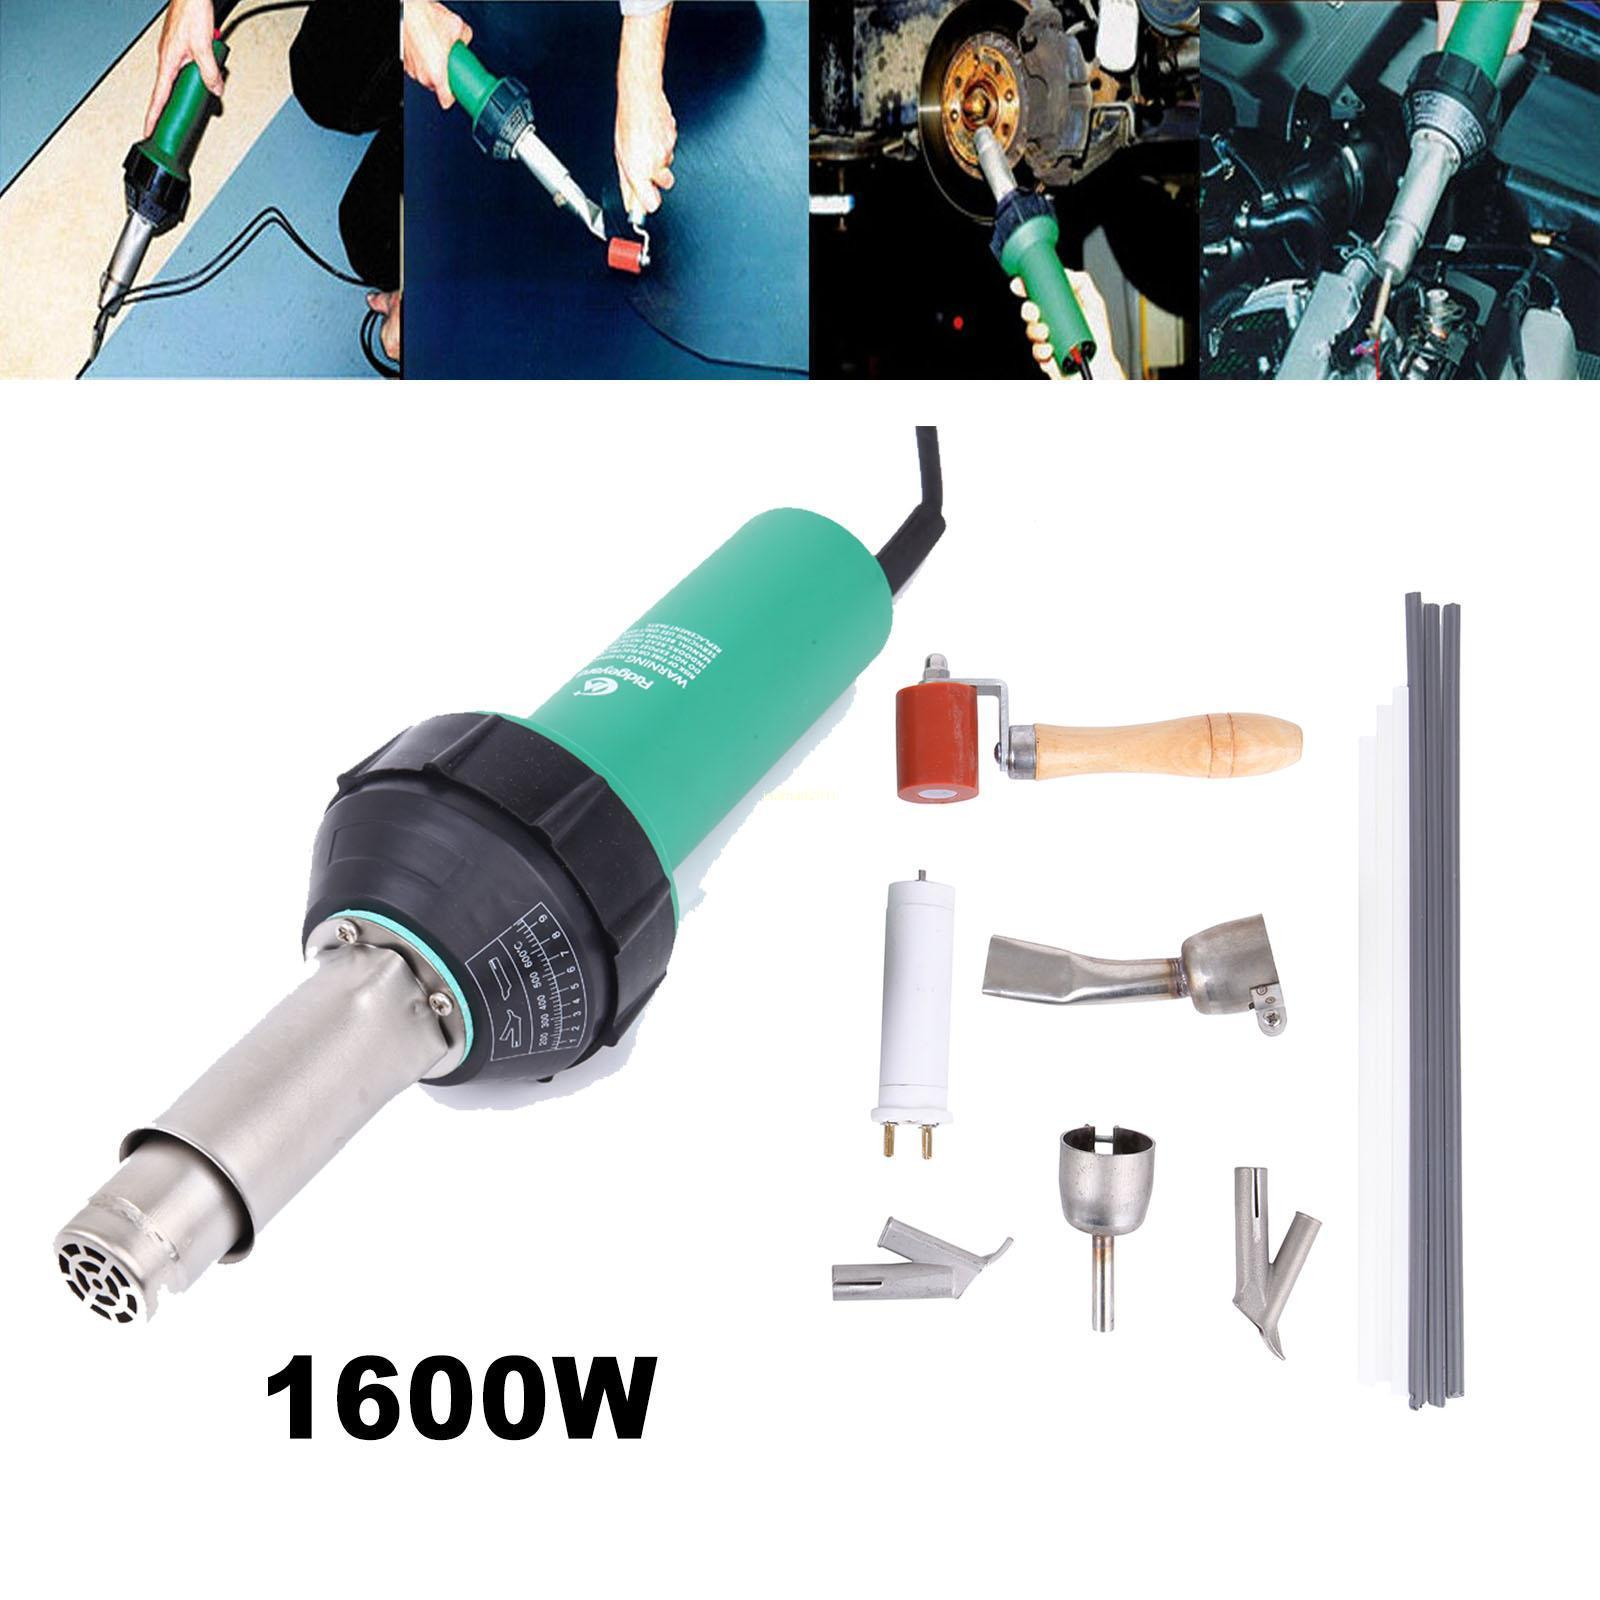 1080W Plastic Welding Hot Air Torch Welder Gun Pistol Tool w// Nozzle /& Roller